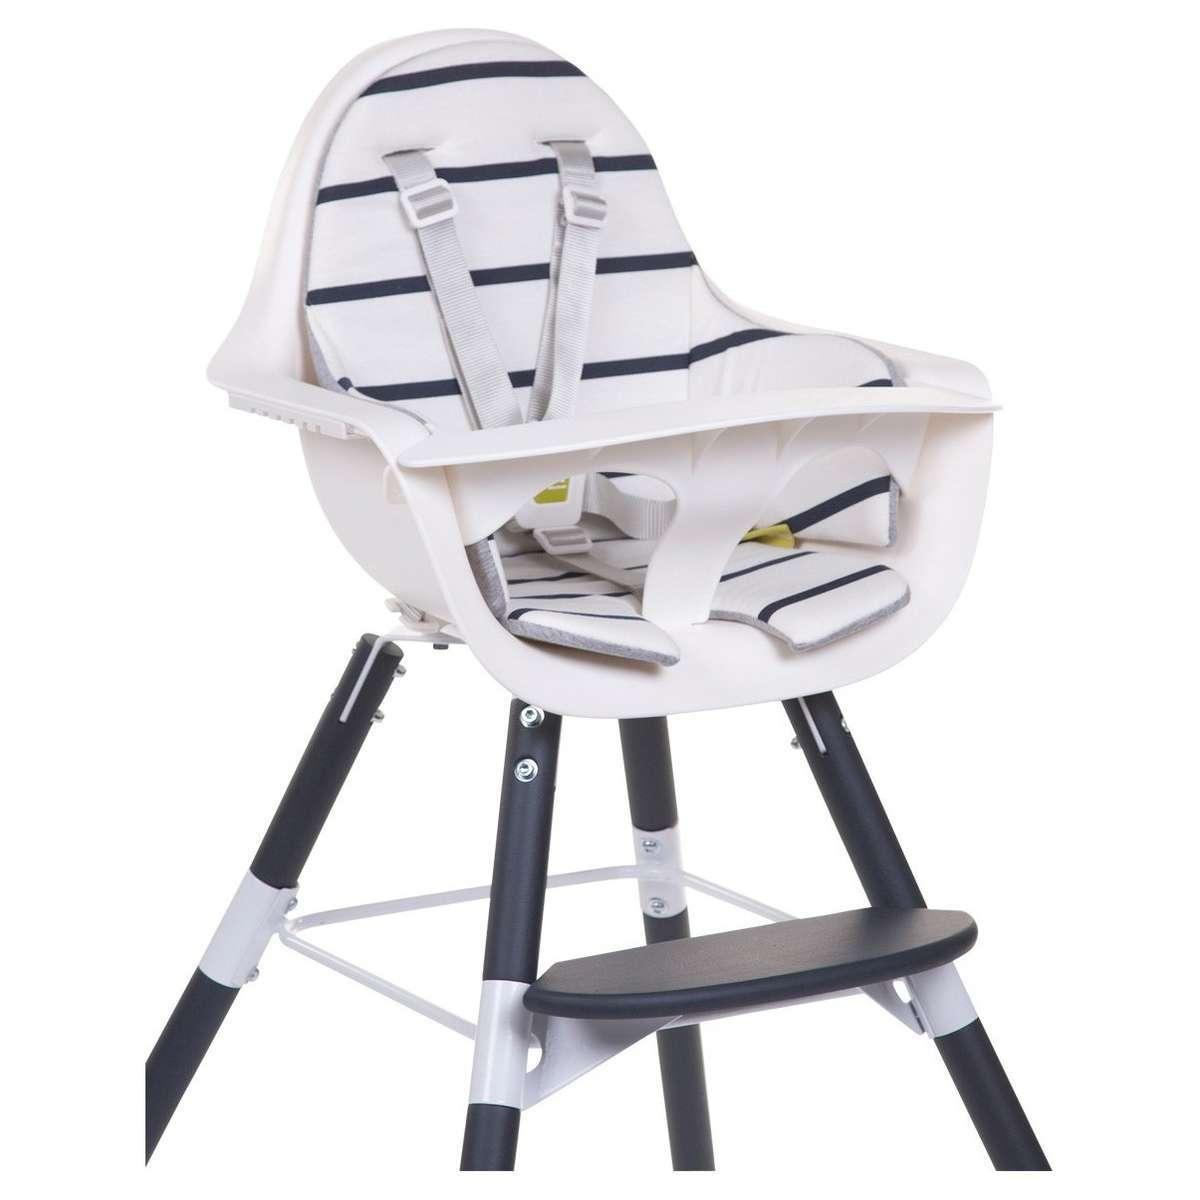 childwood coussin pour chaise haute evolu 2 marin. Black Bedroom Furniture Sets. Home Design Ideas